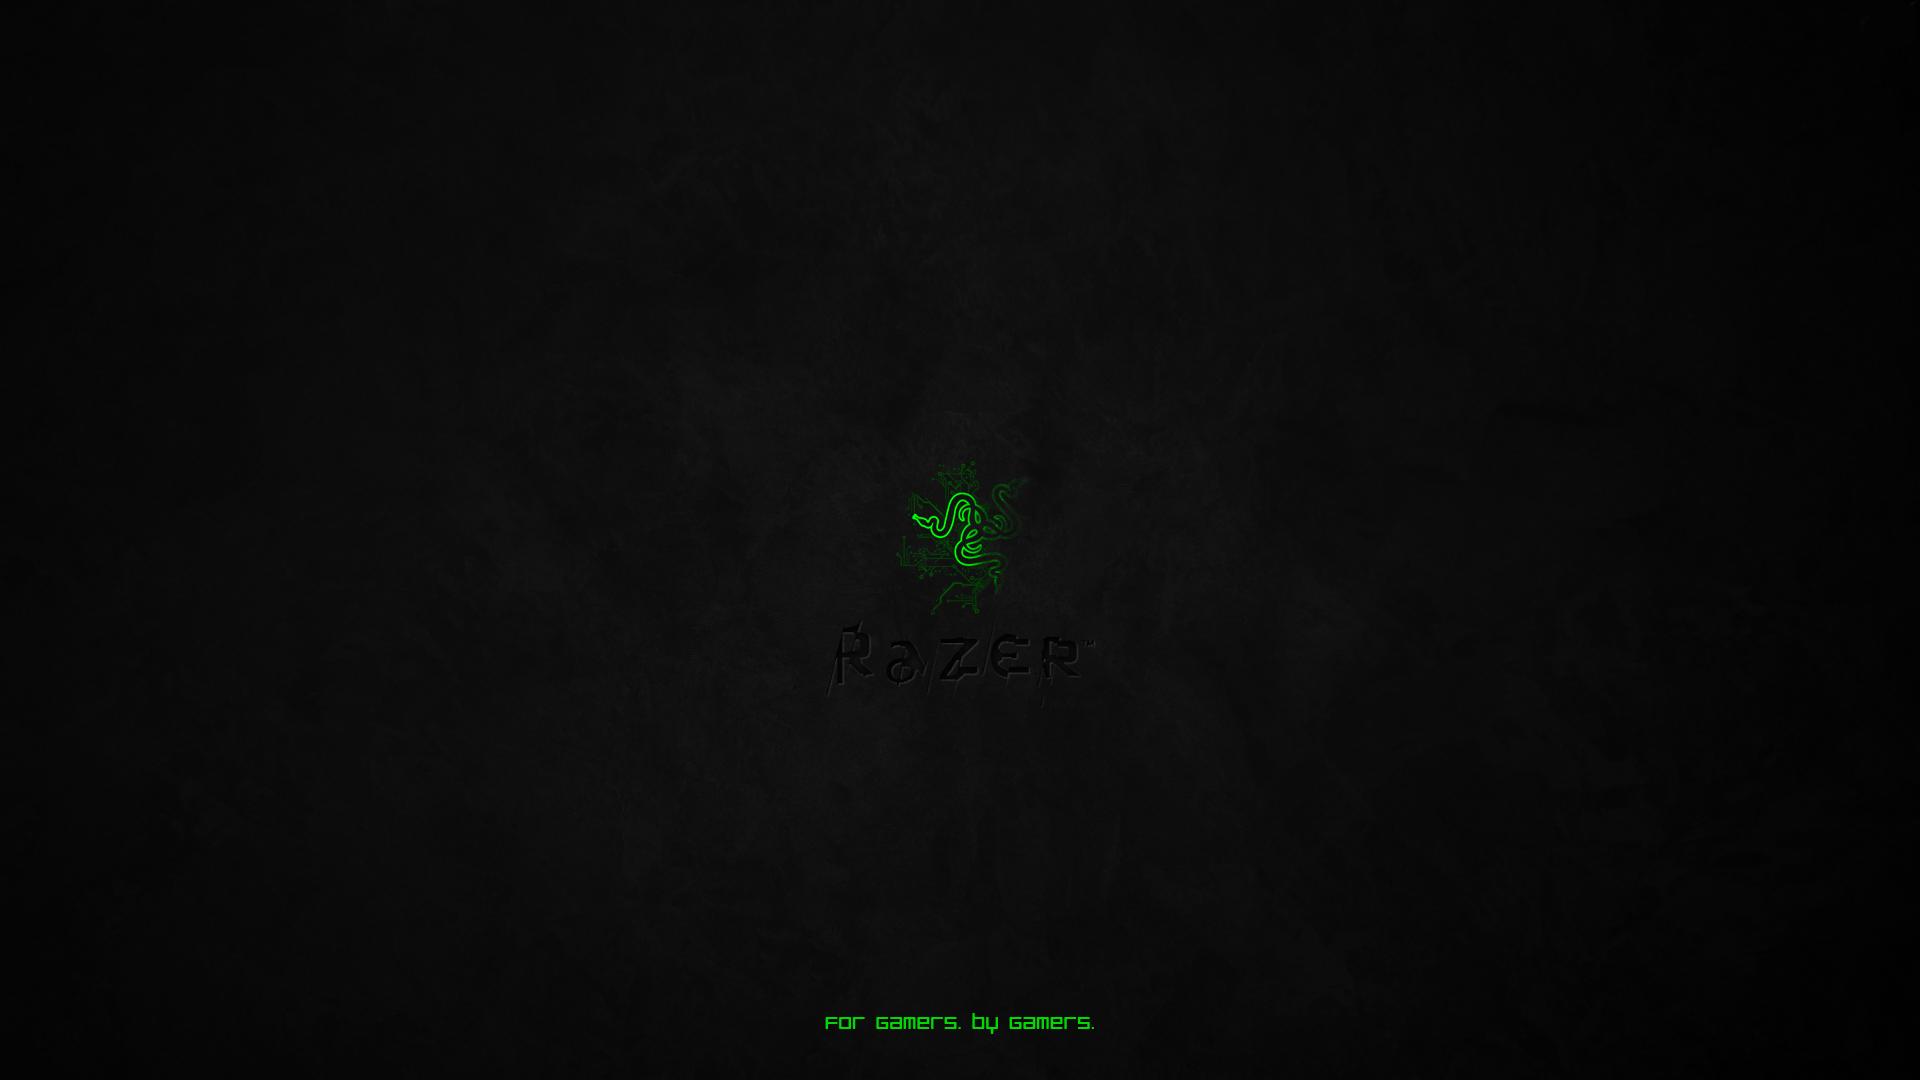 Wallpaper : Razer, darkness, screenshot